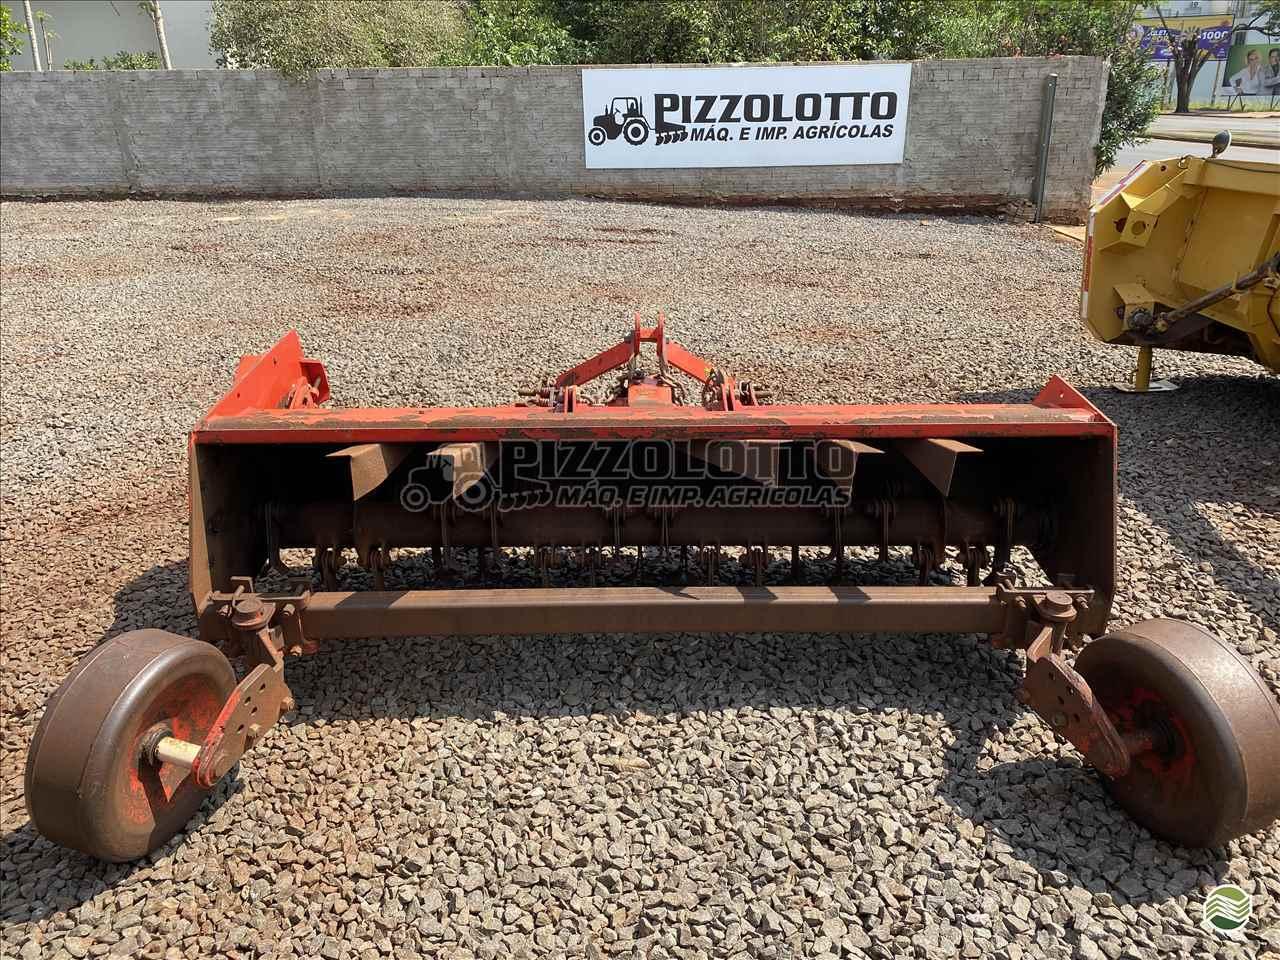 IMPLEMENTOS AGRICOLAS TRITURADOR LIMPEZA TRITURADOR HIDRÁULICO Pizzolotto Máquinas e Implementos Agricolas PALOTINA PARANÁ PR